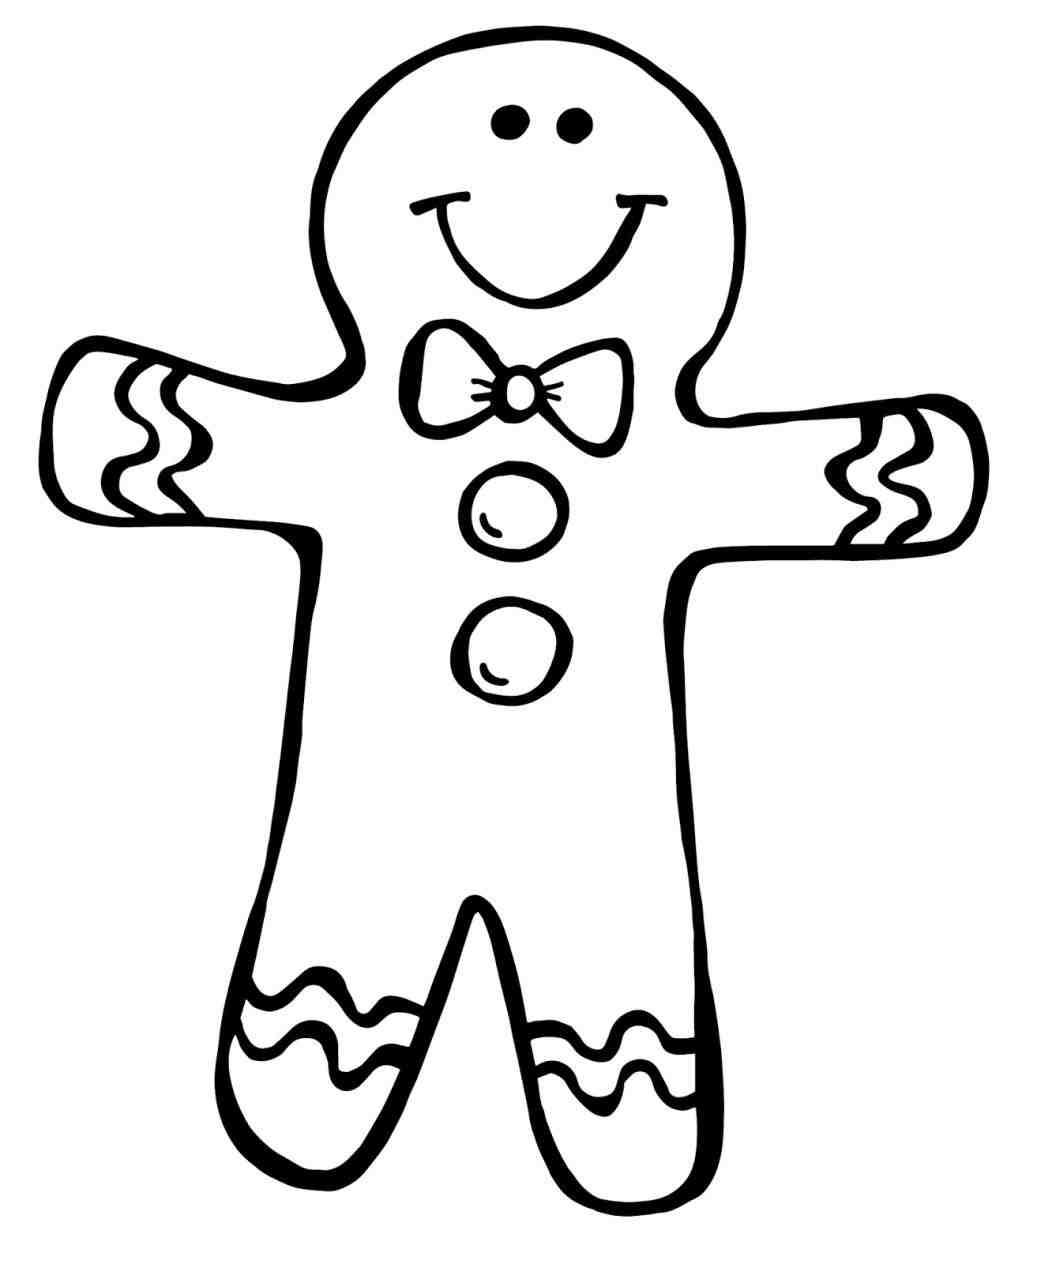 1037x1264 Christmas Gingerbread Man Clipart Chemineewebsite